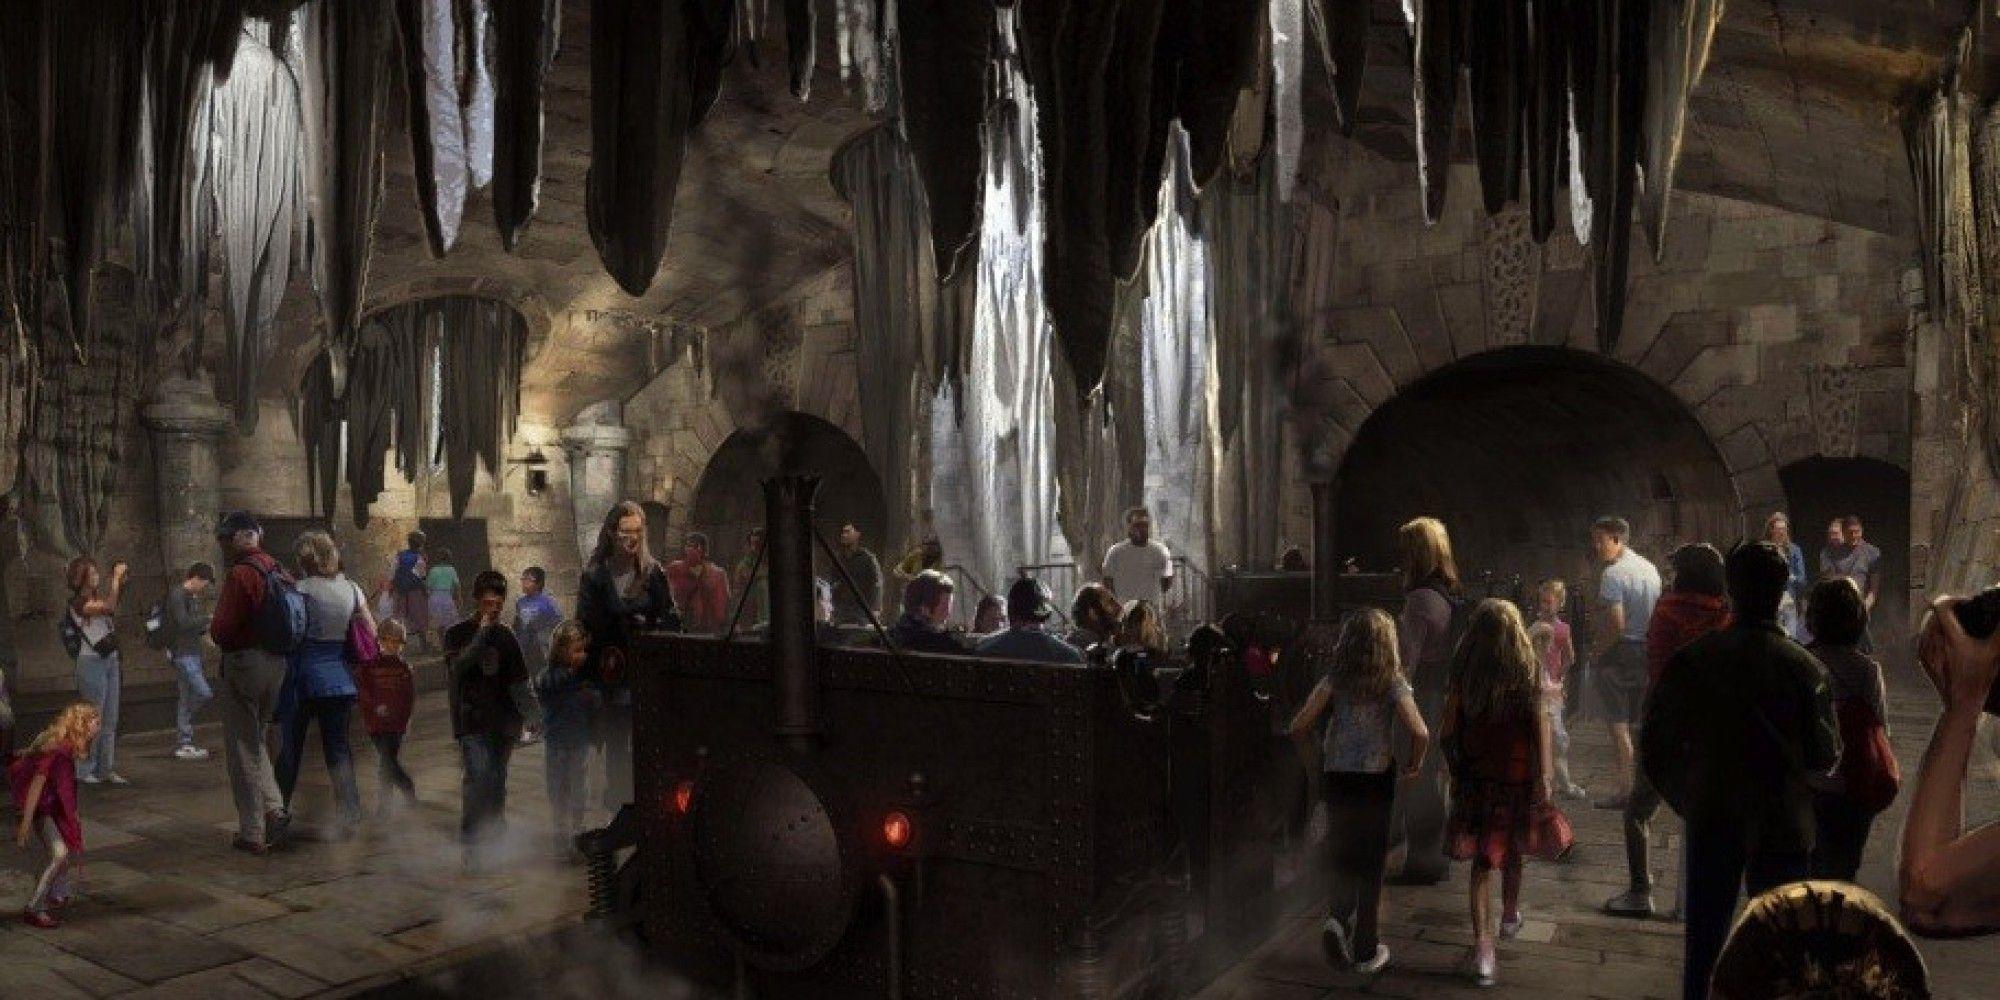 Sneak Peek At Universal S New Harry Potter Ride Harry Potter Ride Universal Studios Orlando Wizarding World Of Harry Potter